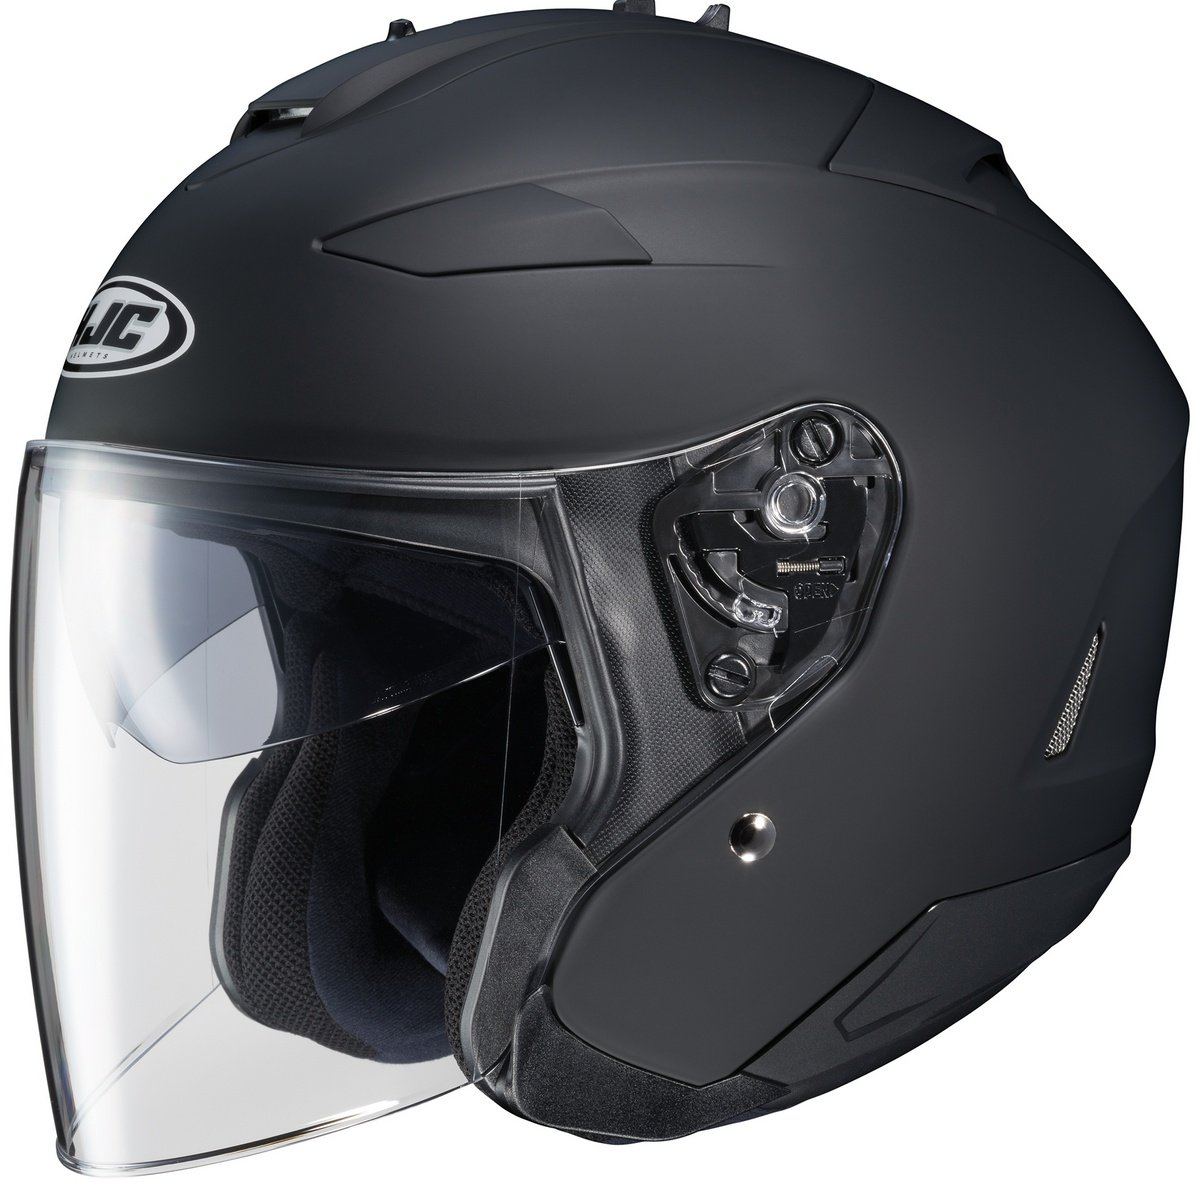 HJC IS-33 Helmet Apus BLACK//GOLD LARGE